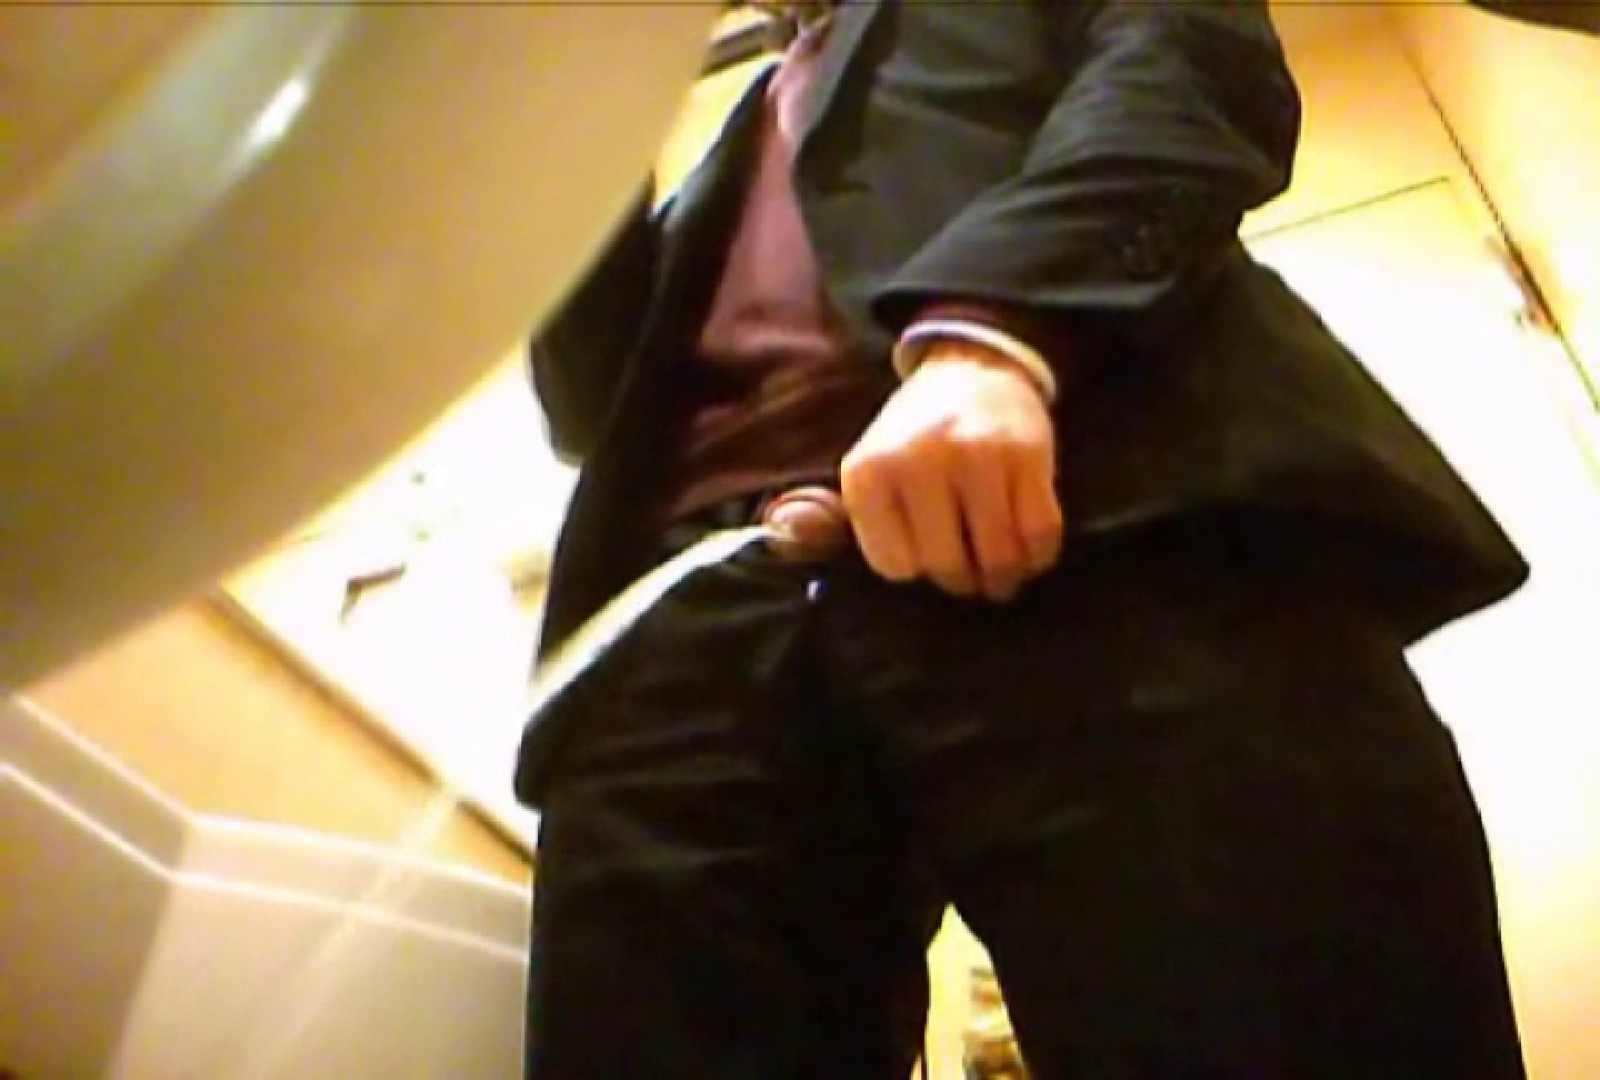 SEASON 2ND!掴み取りさんの洗面所覗き!in新幹線!VOL.02 スーツボーイズ | ノンケボーイズ  82pic 58